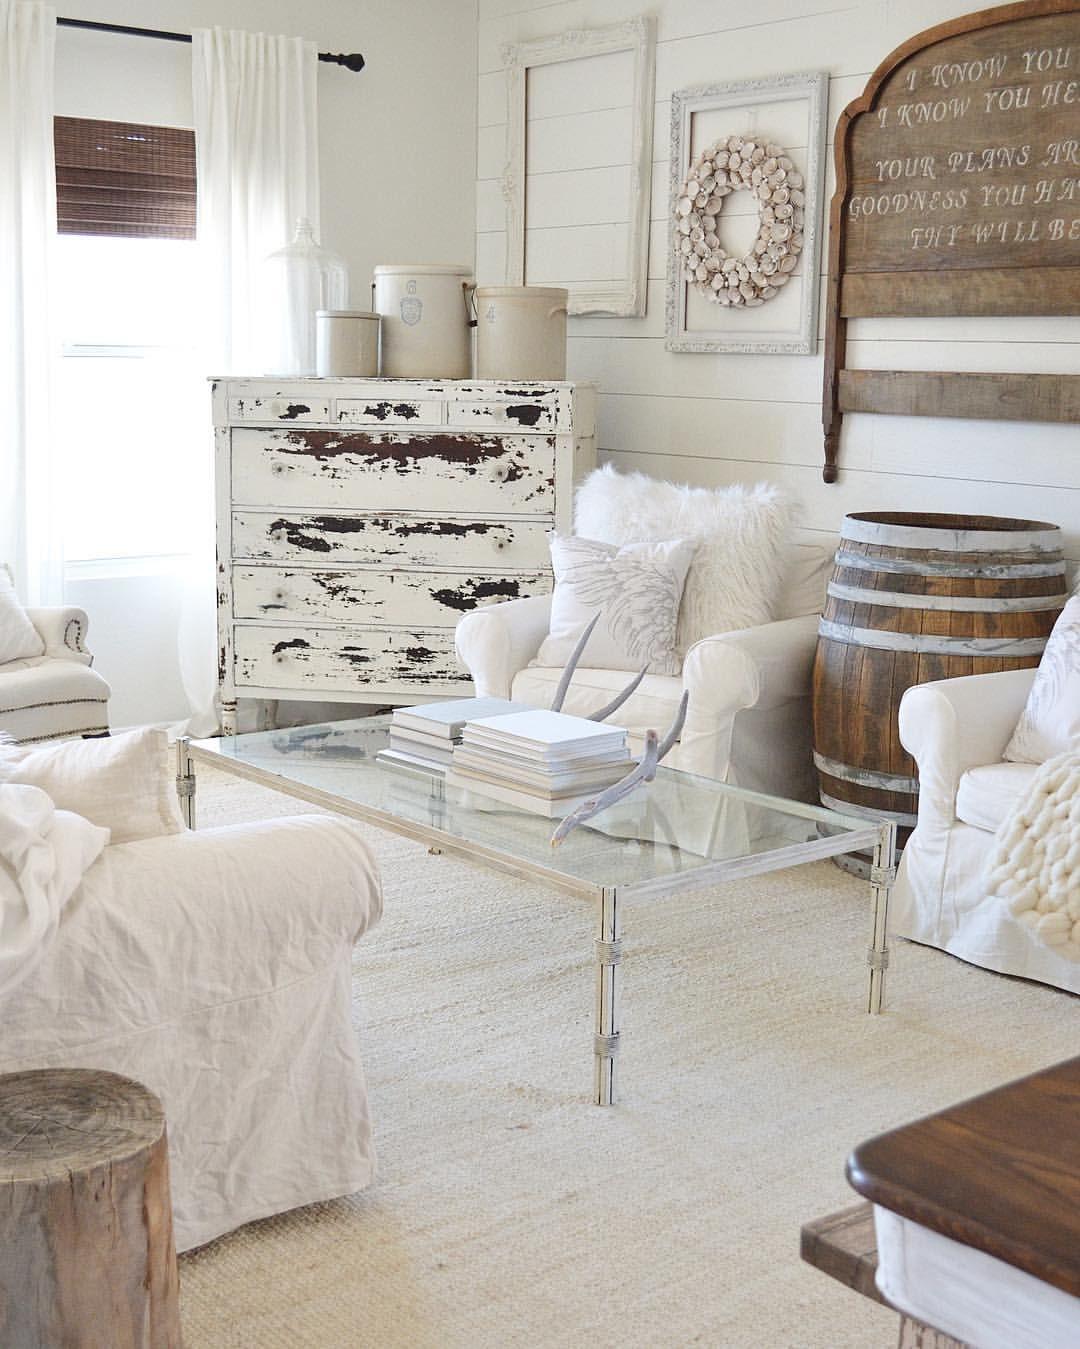 Milk painted dresser with @oldbarnmilkpaint, farmhouse style decor ...